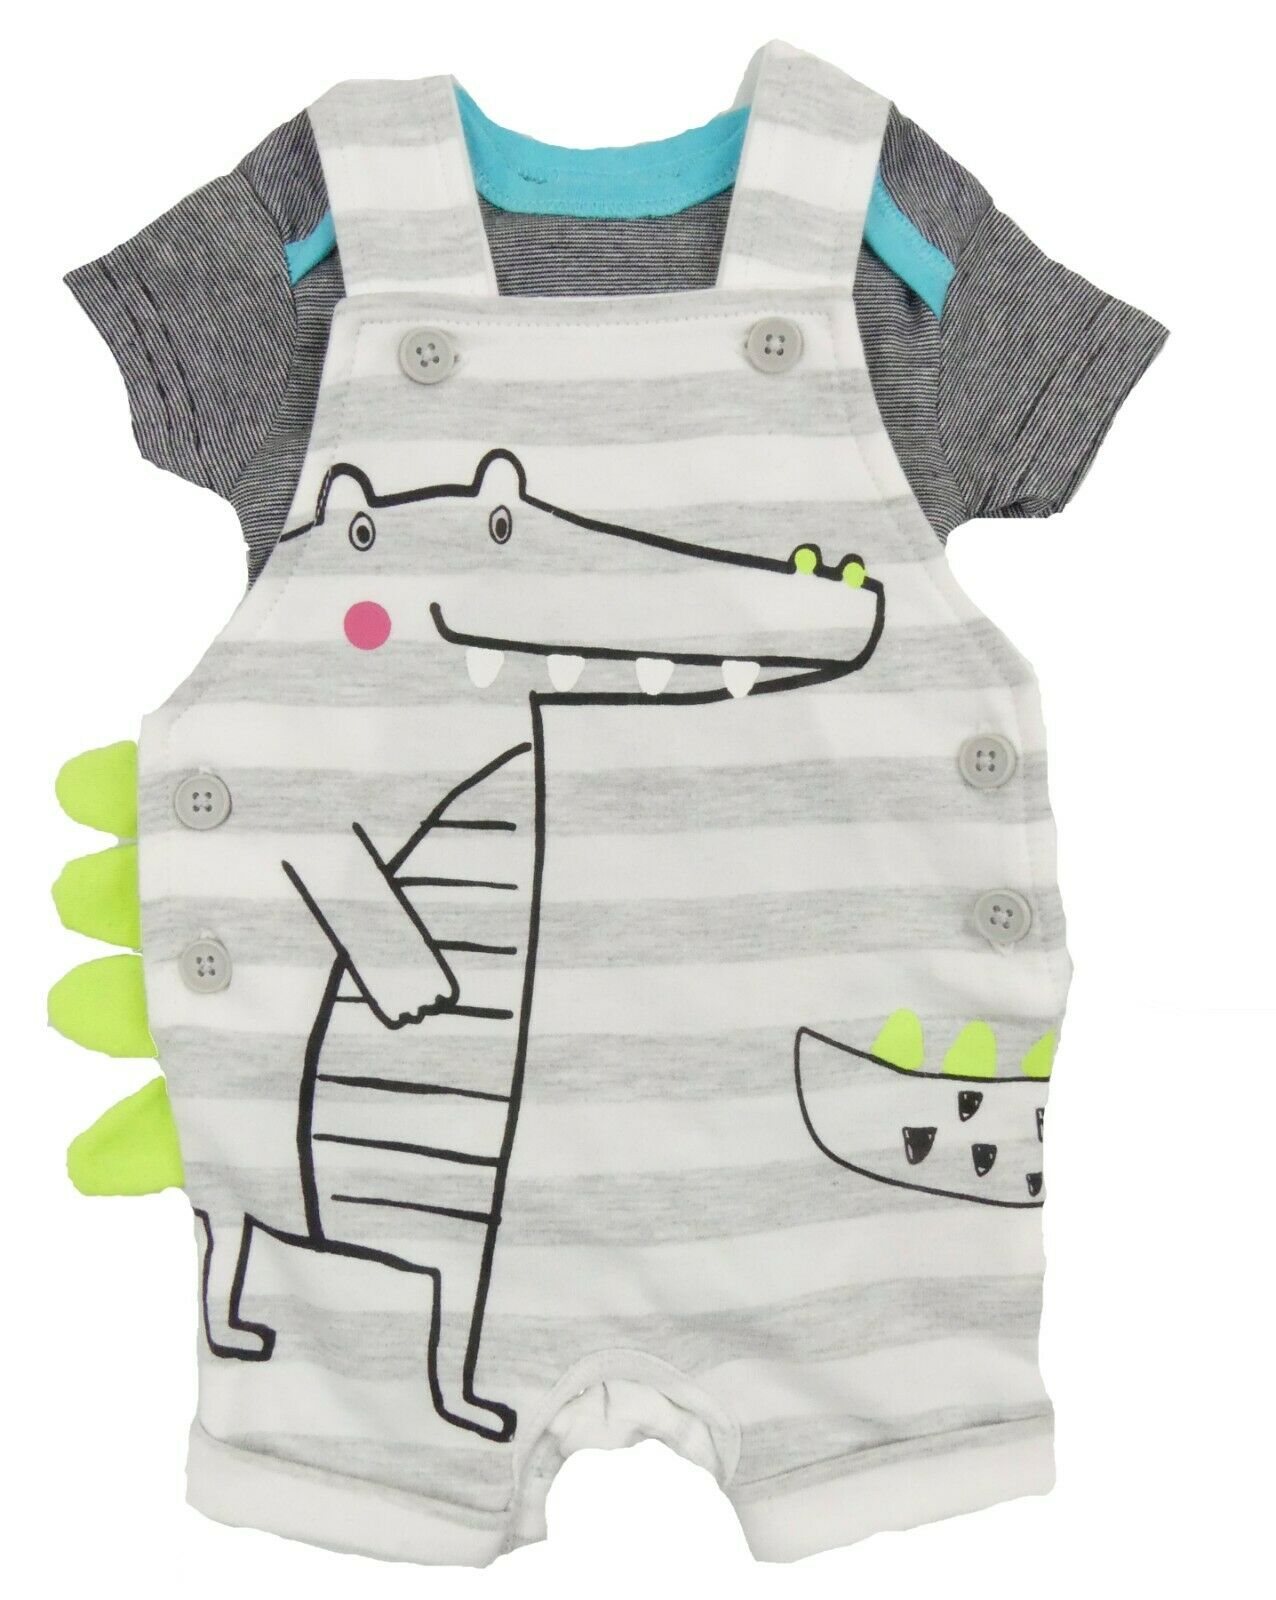 Baby Toddler Kids Boys Outfit 2 pcs Set T-shirt /& Shorts 6-9//9-12 m 2-3// 3-4 Y